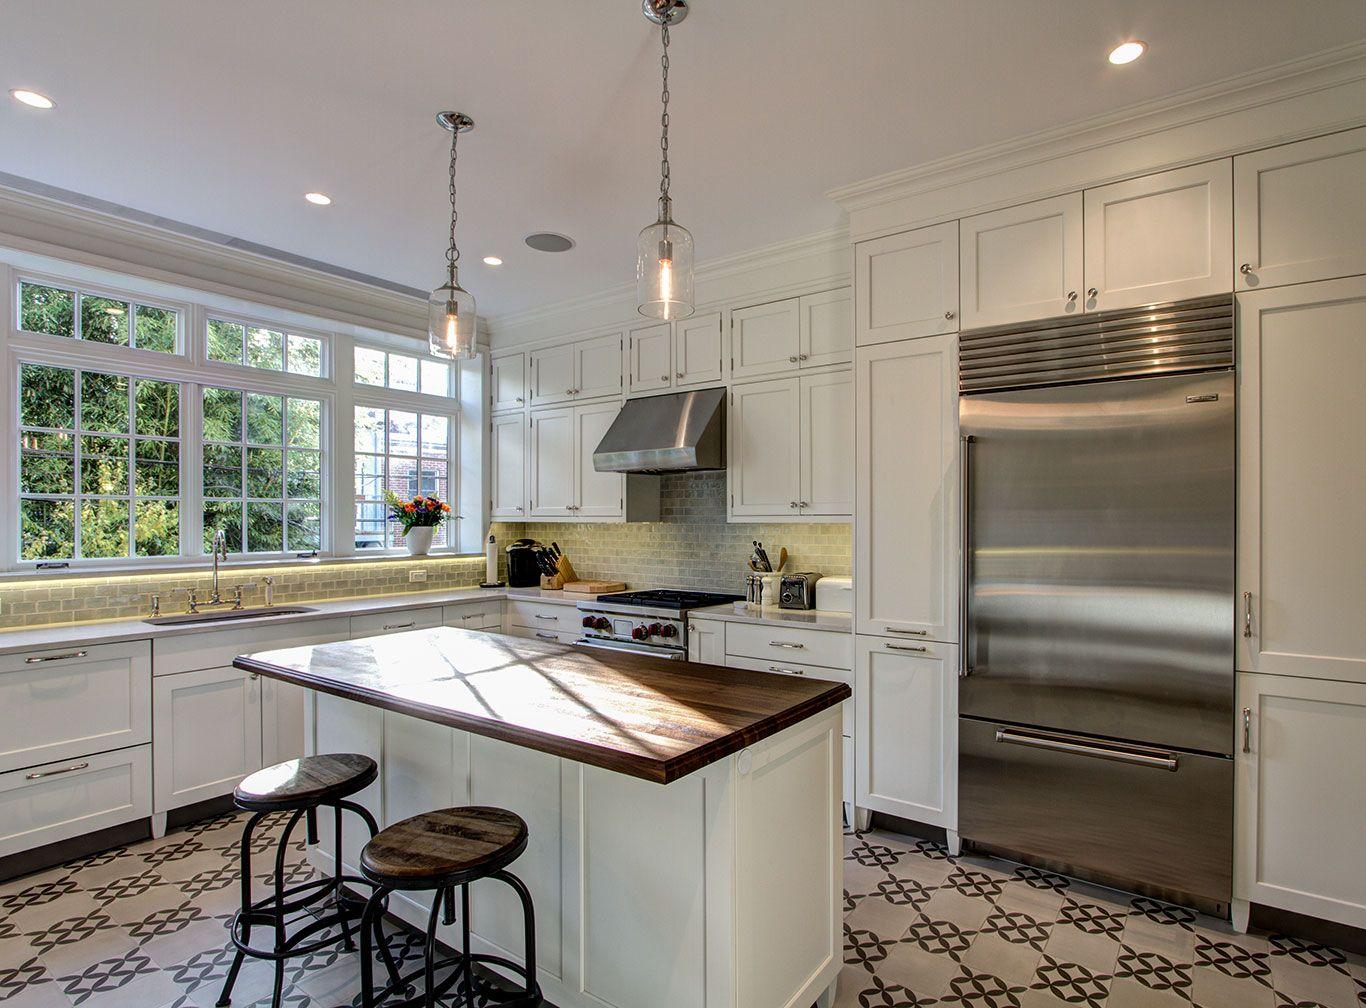 Kitchen in Brooklyn townhouse renovation. Ben Herzog, Architect ...